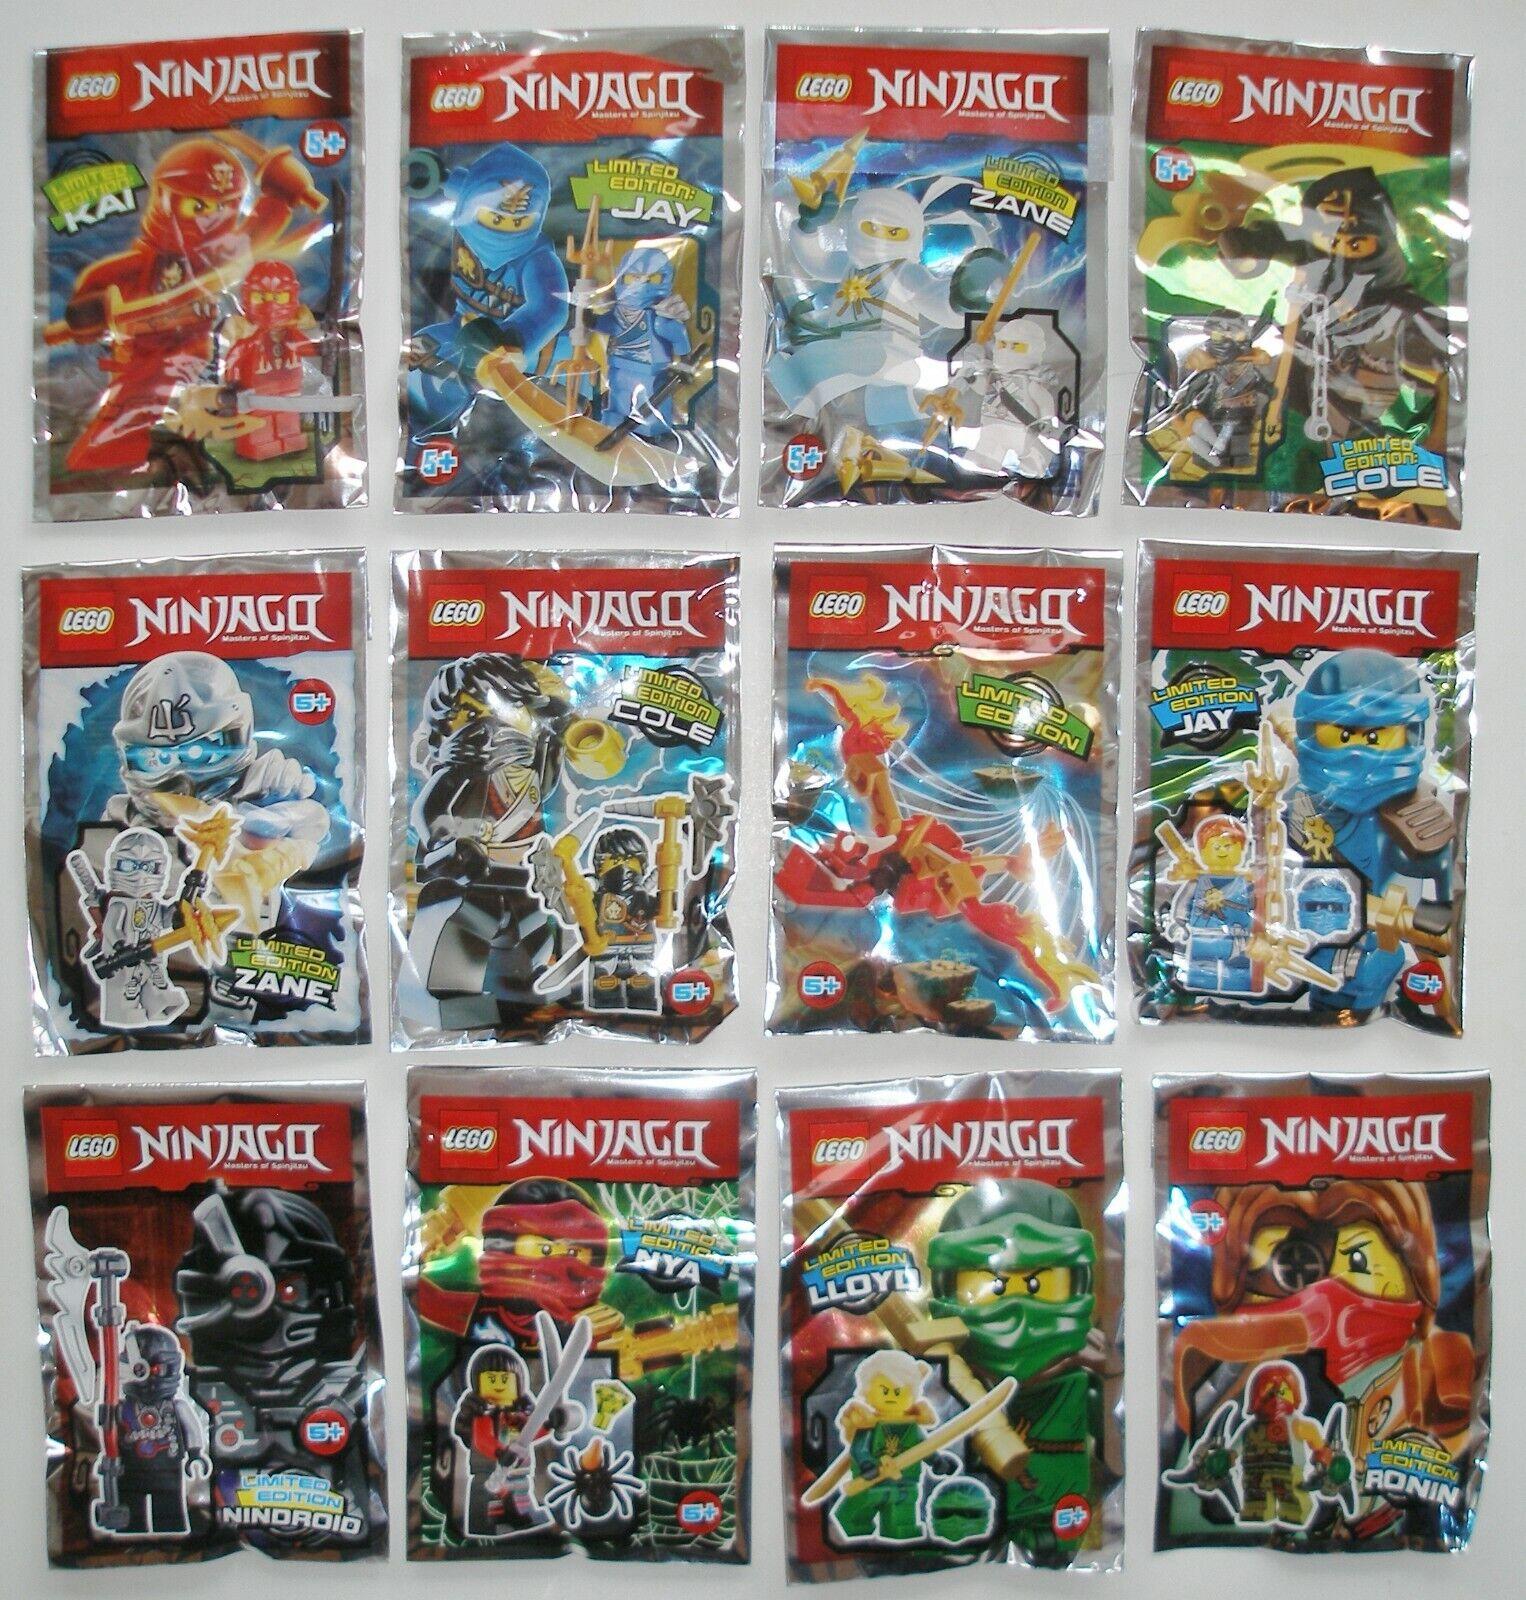 LEGO Ninjago Magazine Issue 62 Minifigure Ninja Cole With Cyber Hammer  günstig kaufen